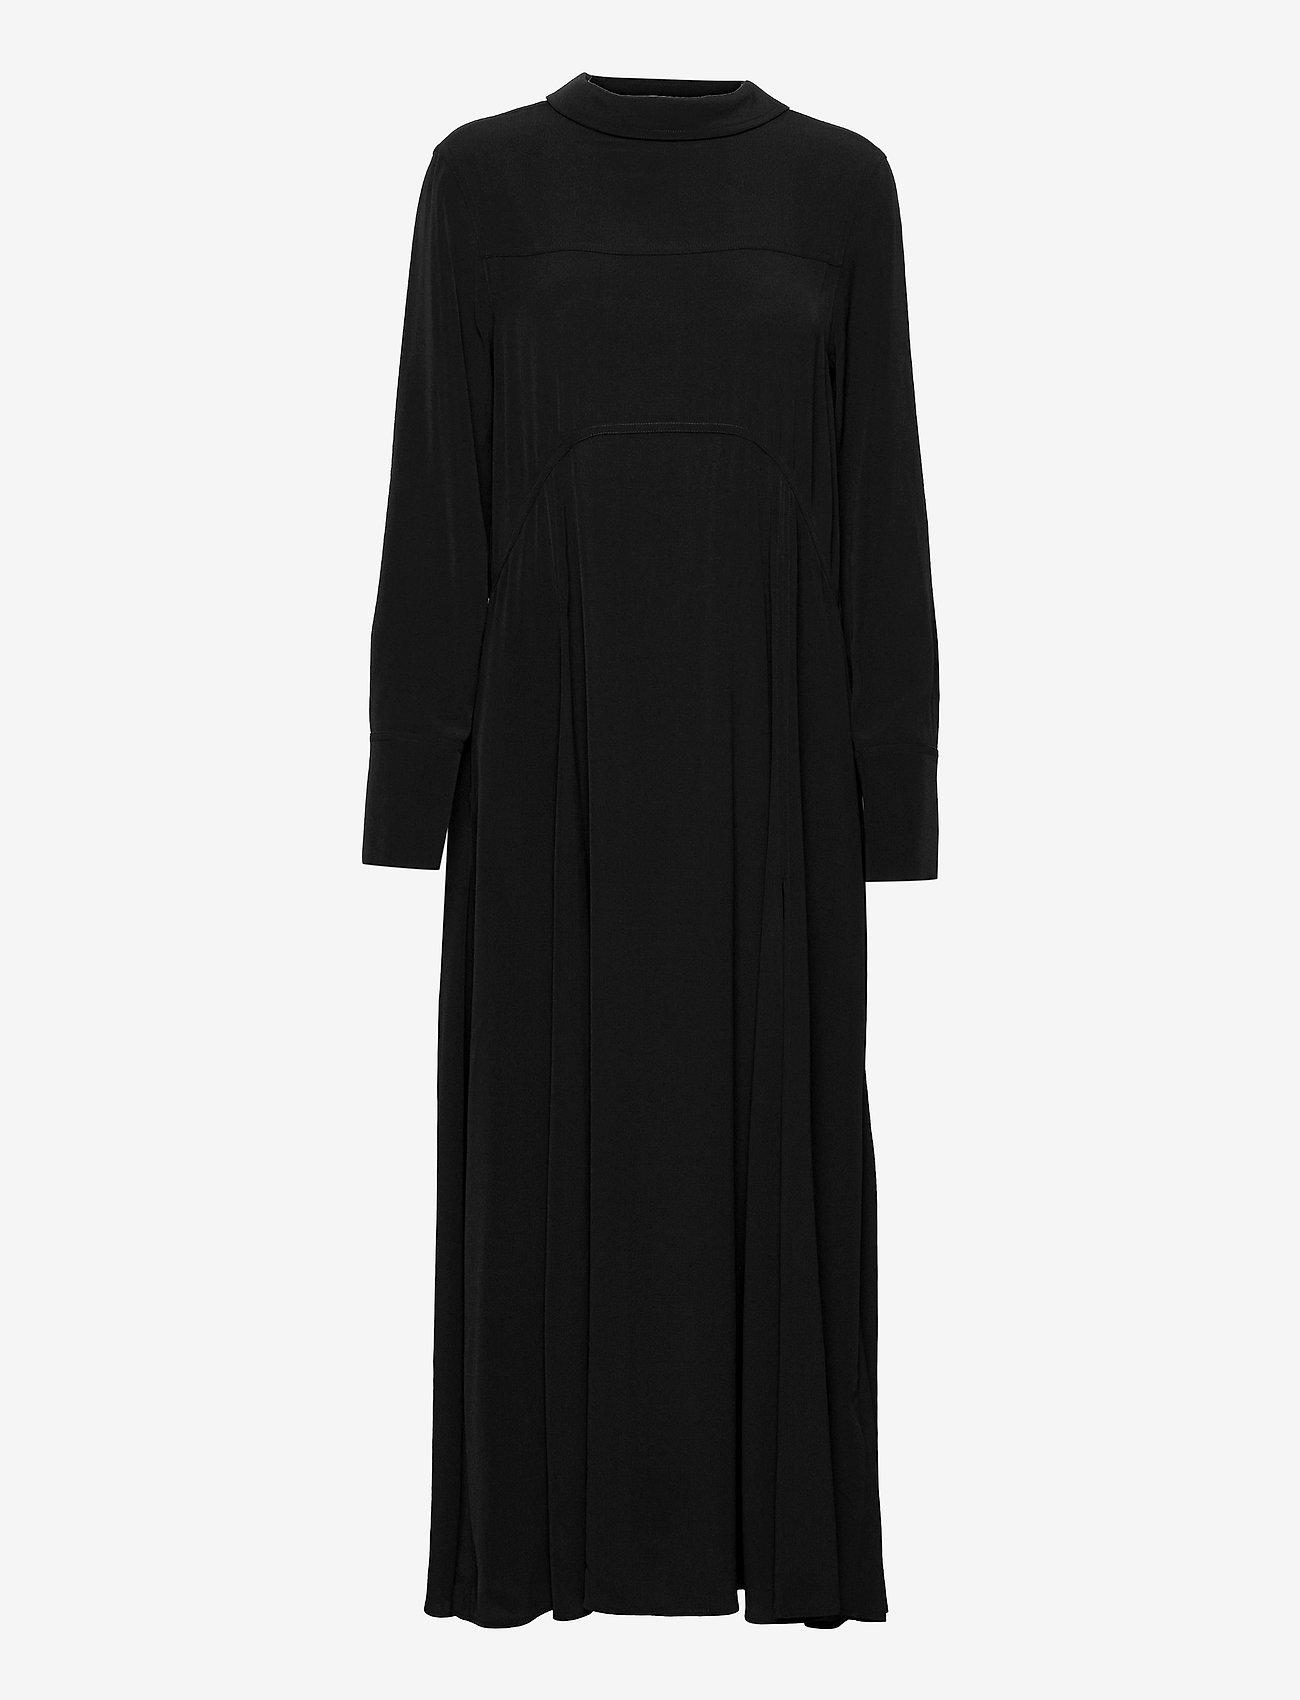 Victoria Victoria Beckham - LONG SLEEVE MAXI DRESS - evening dresses - black - 0